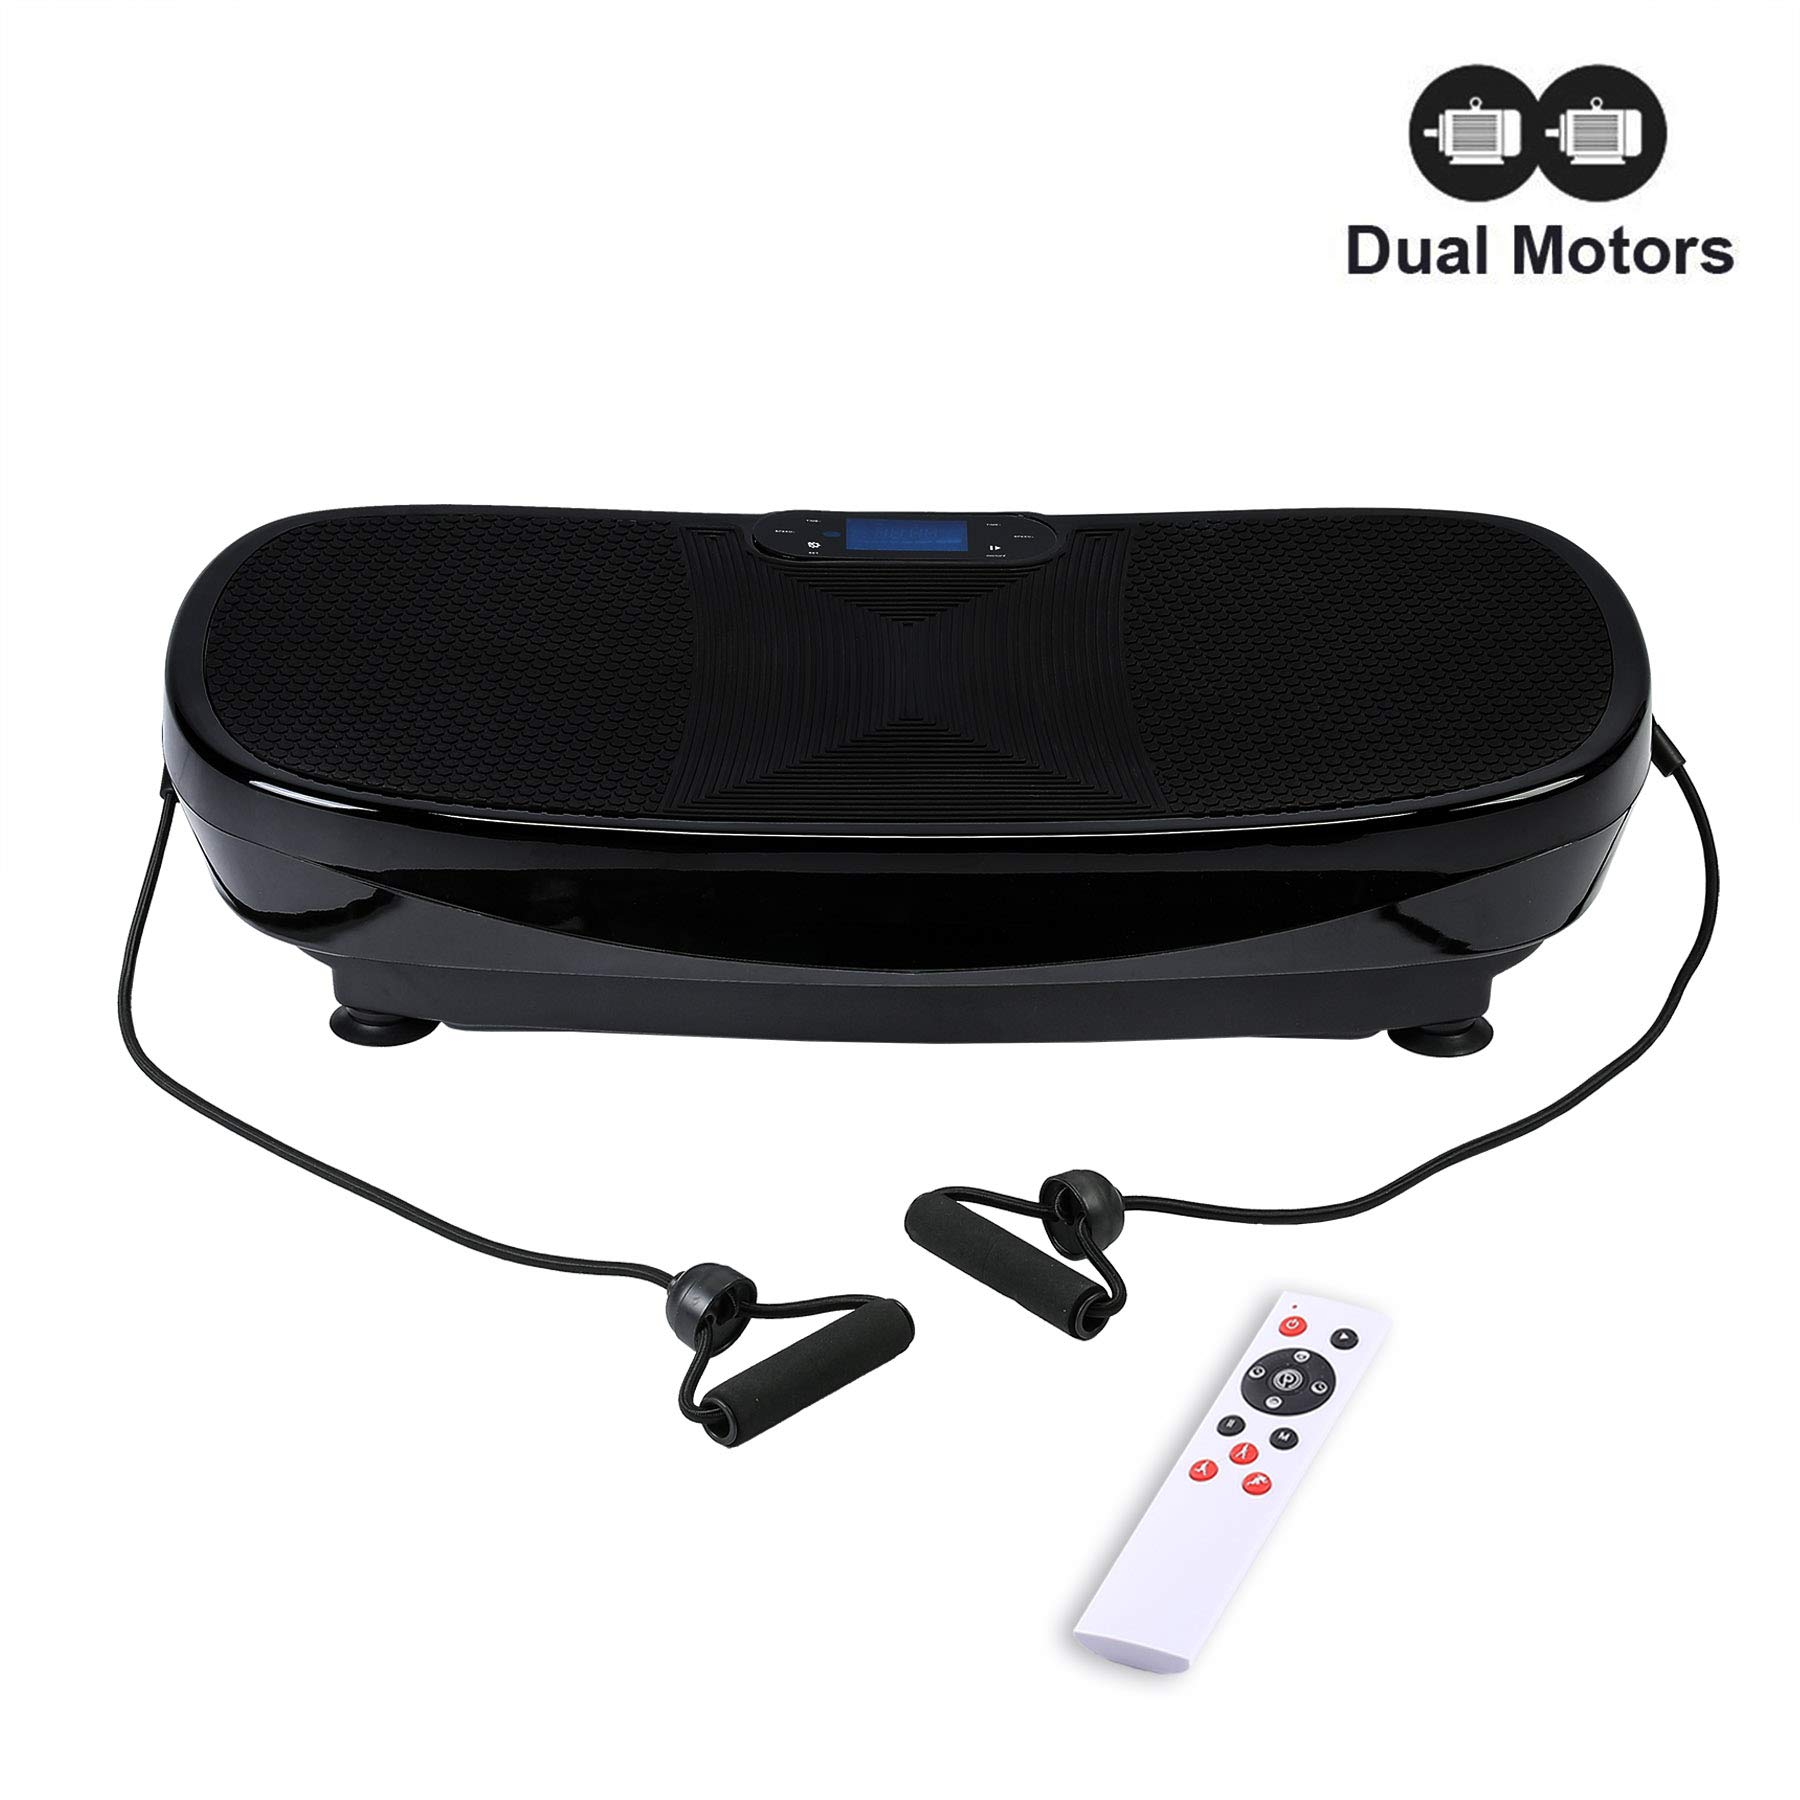 Z ZELUS 3D Fitness Whole Body Vibration Platform Machine - 400W Dual Motors Vibration Plate Crazy Fit Massage Exercise Machine with Remote Control and Resistance Bands (Upgraded Black)